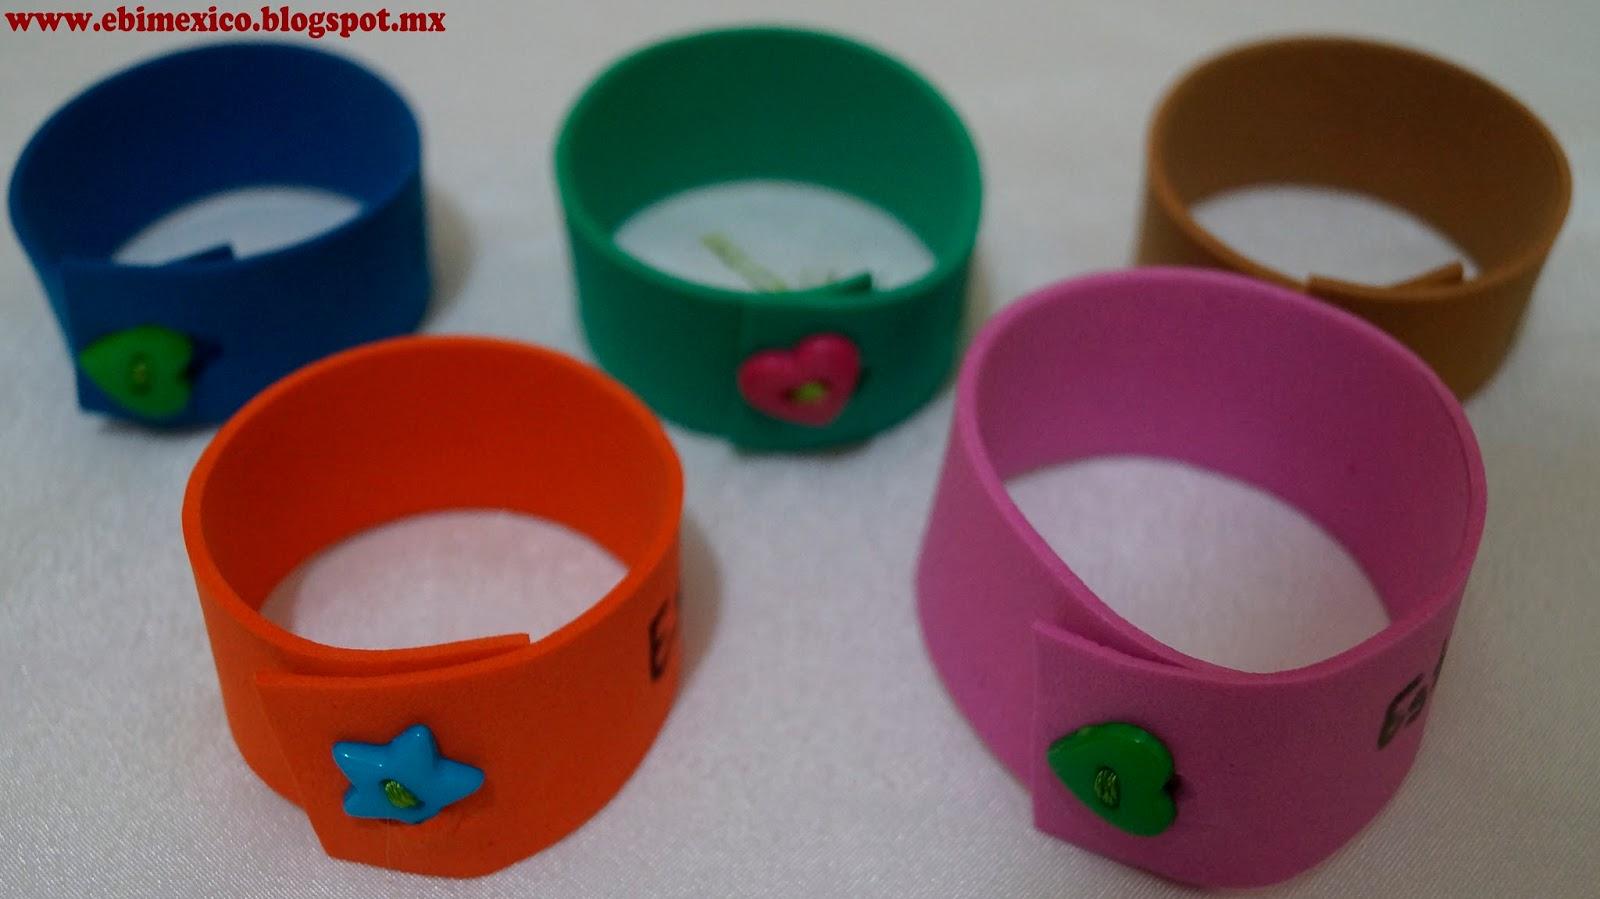 Pin pulseras de foami on pinterest for Como hacer pulseras de goma eva